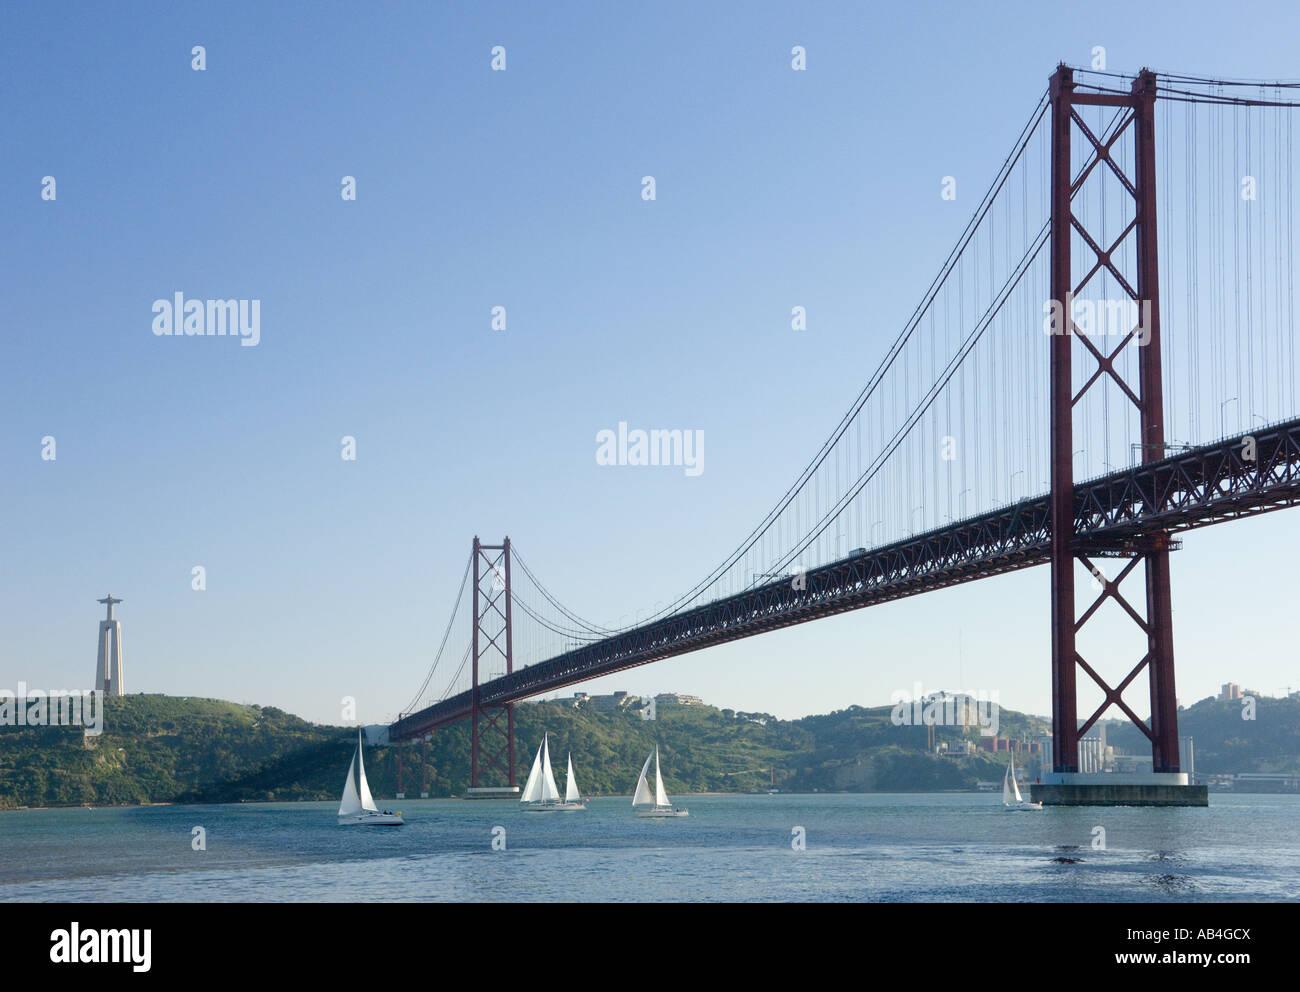 25th Of April Bridge & Bom Jesu Monument - Stock Image